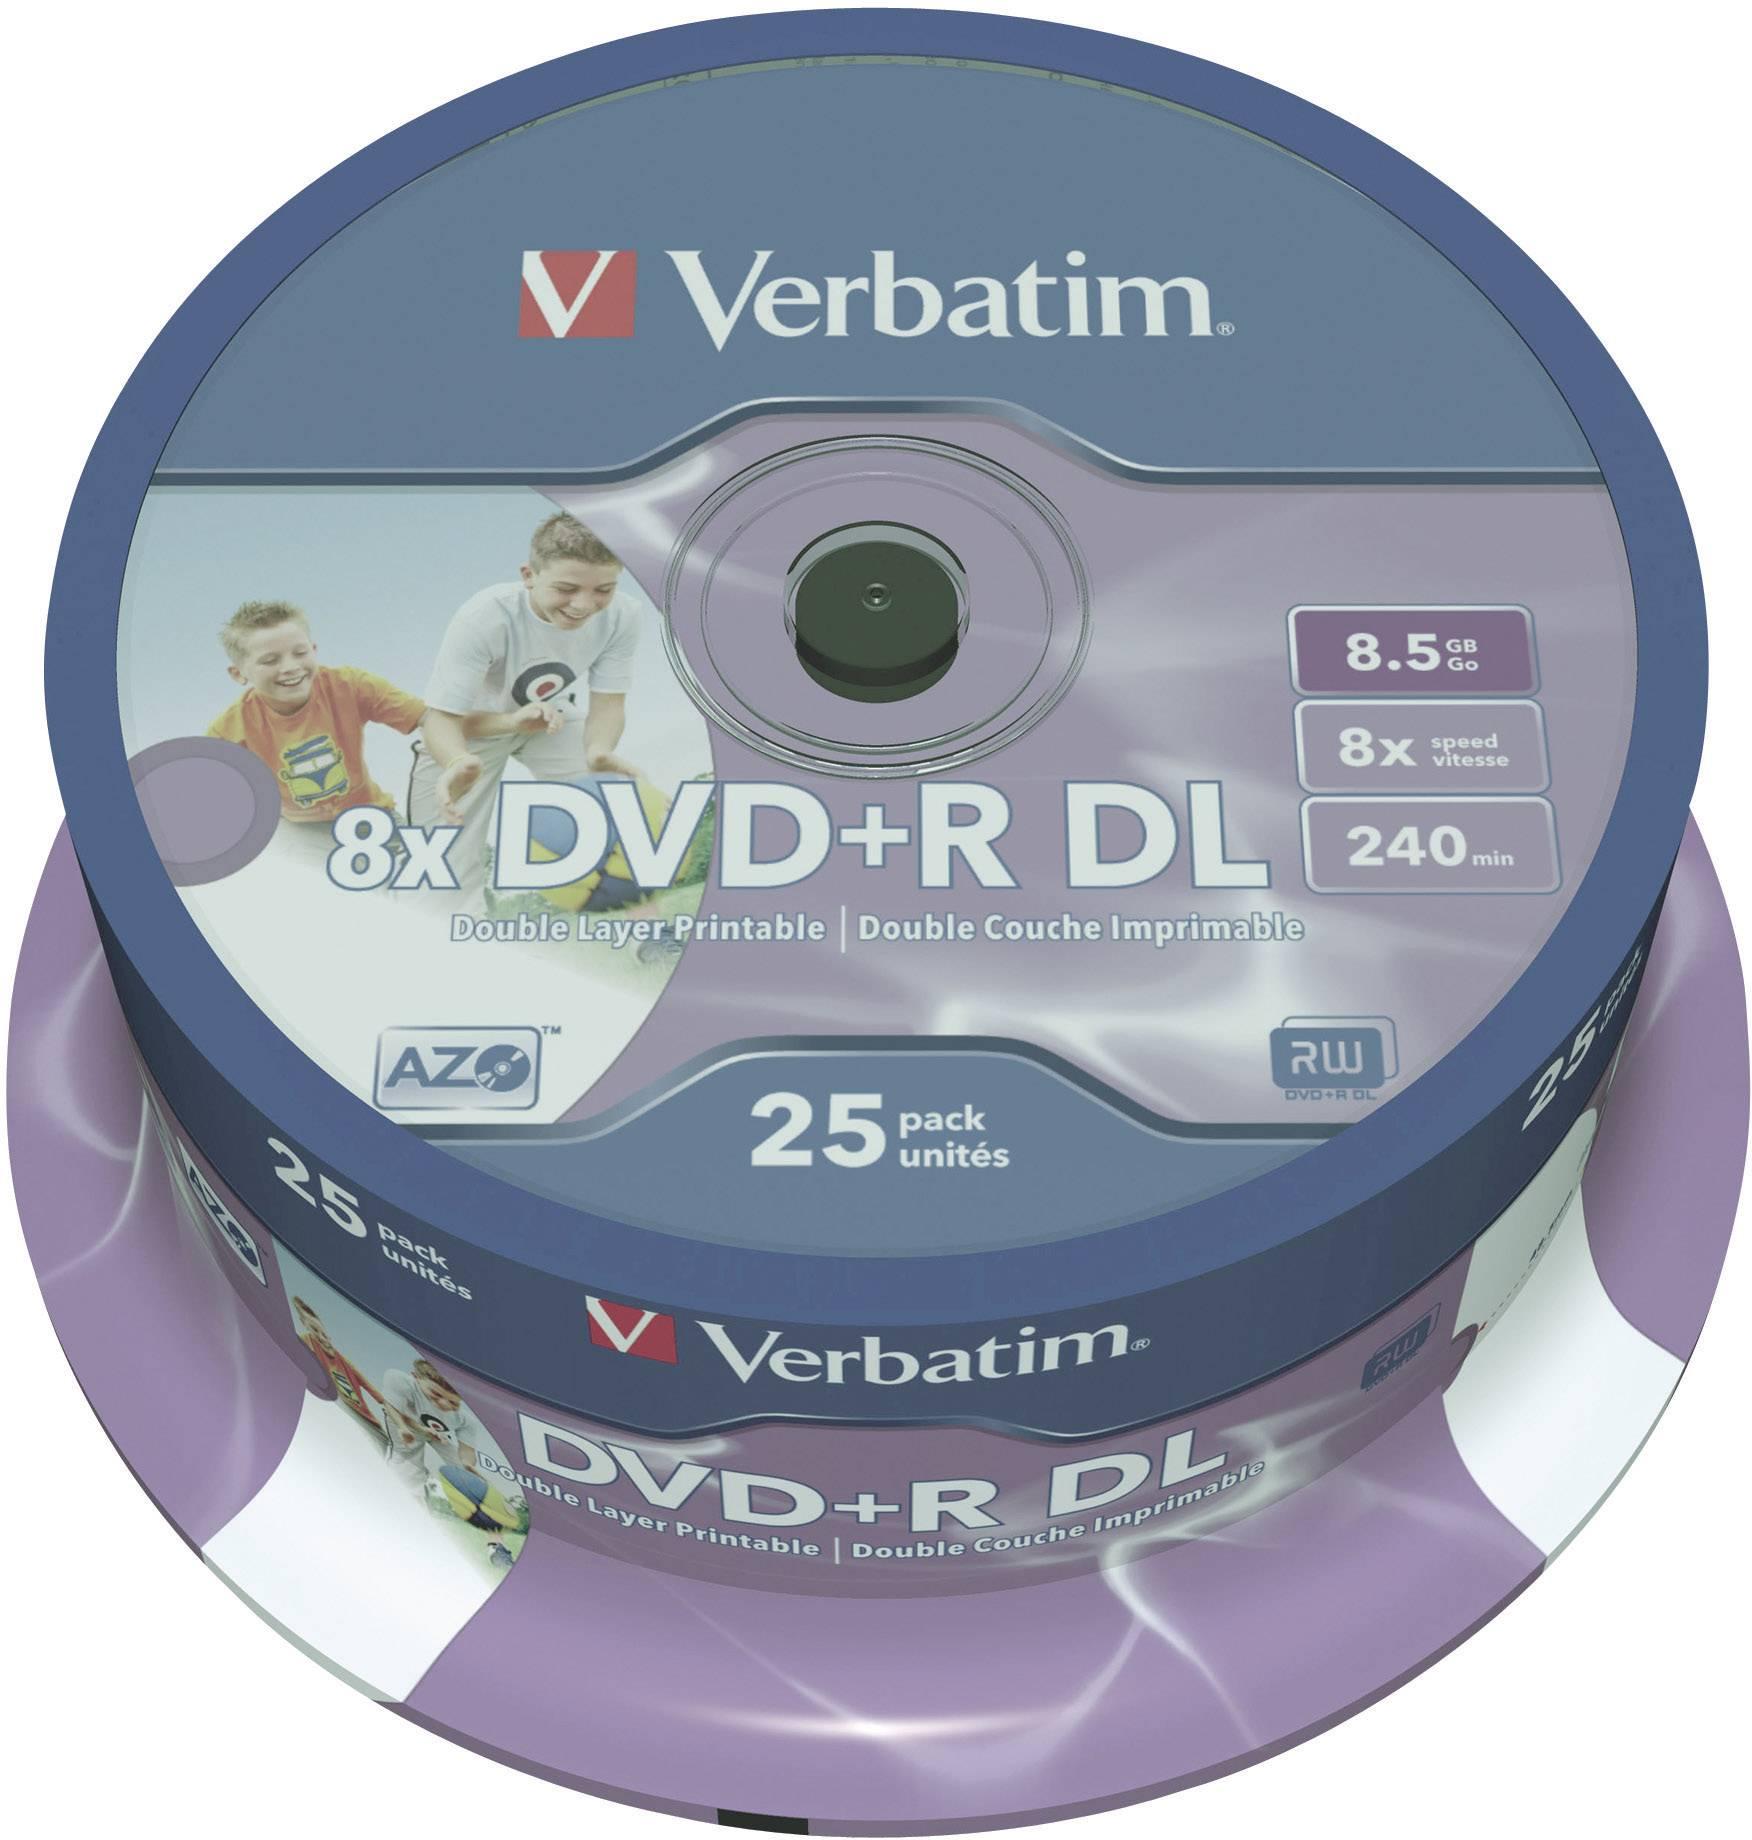 DVD+R DL 8.5 GB Verbatim 43667, možnosť potlače, 25 ks, vreteno